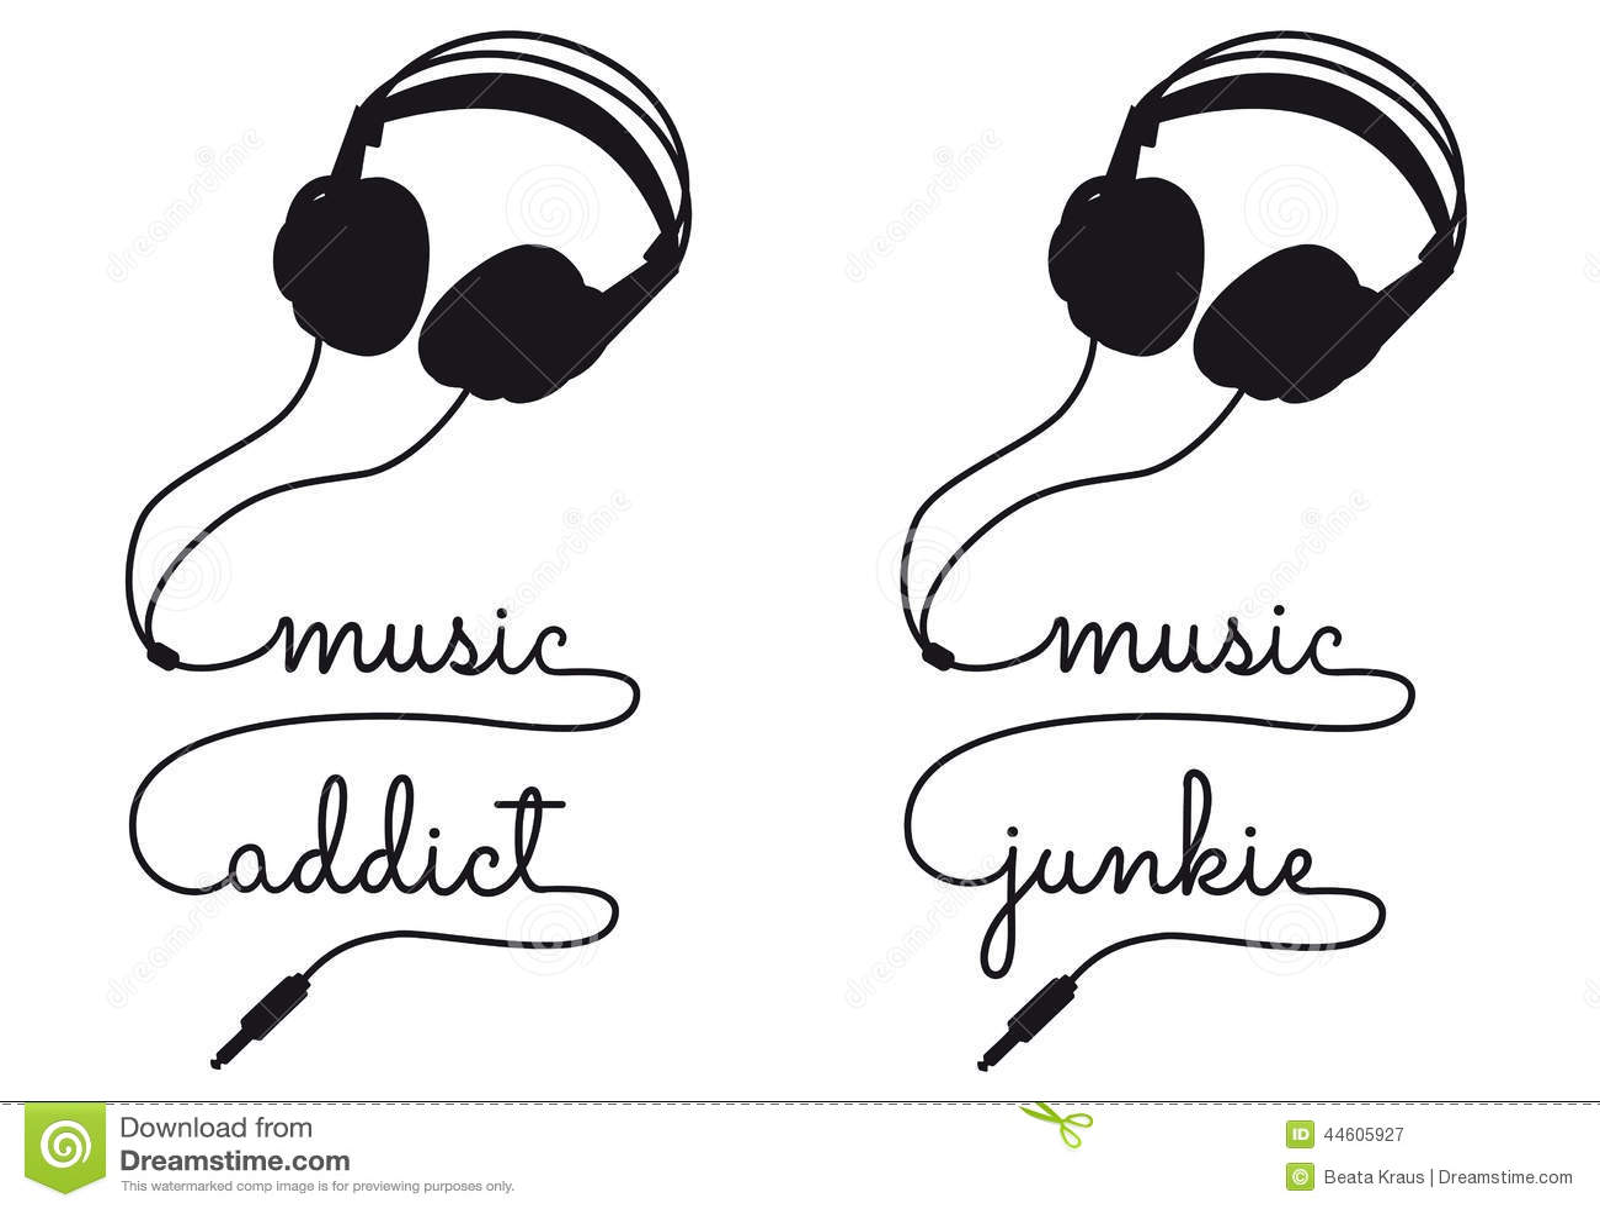 Music Addict Vector Headphone Stock Vector